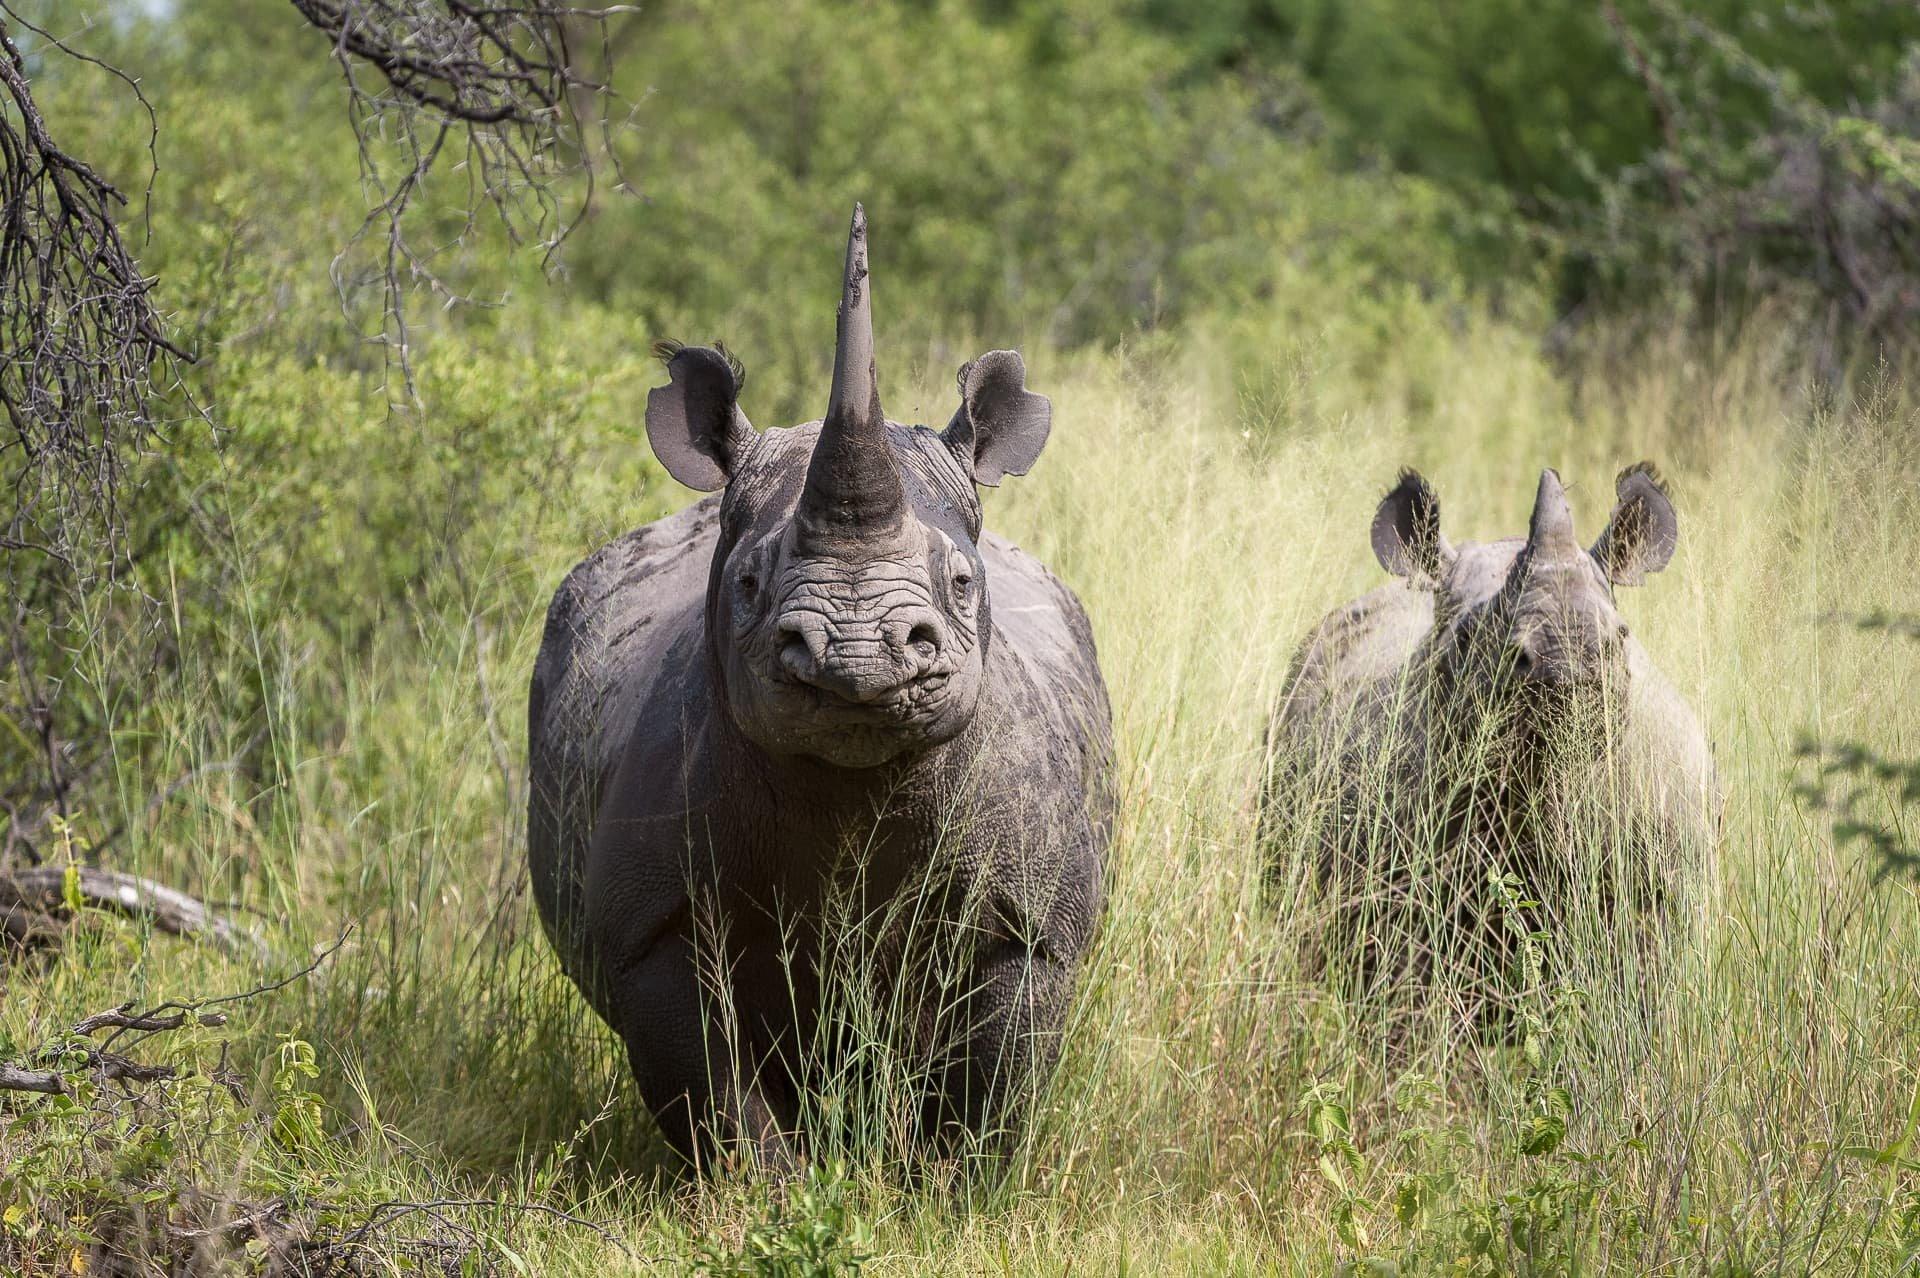 Safari África - Rinocerontes - The Indiana Travel